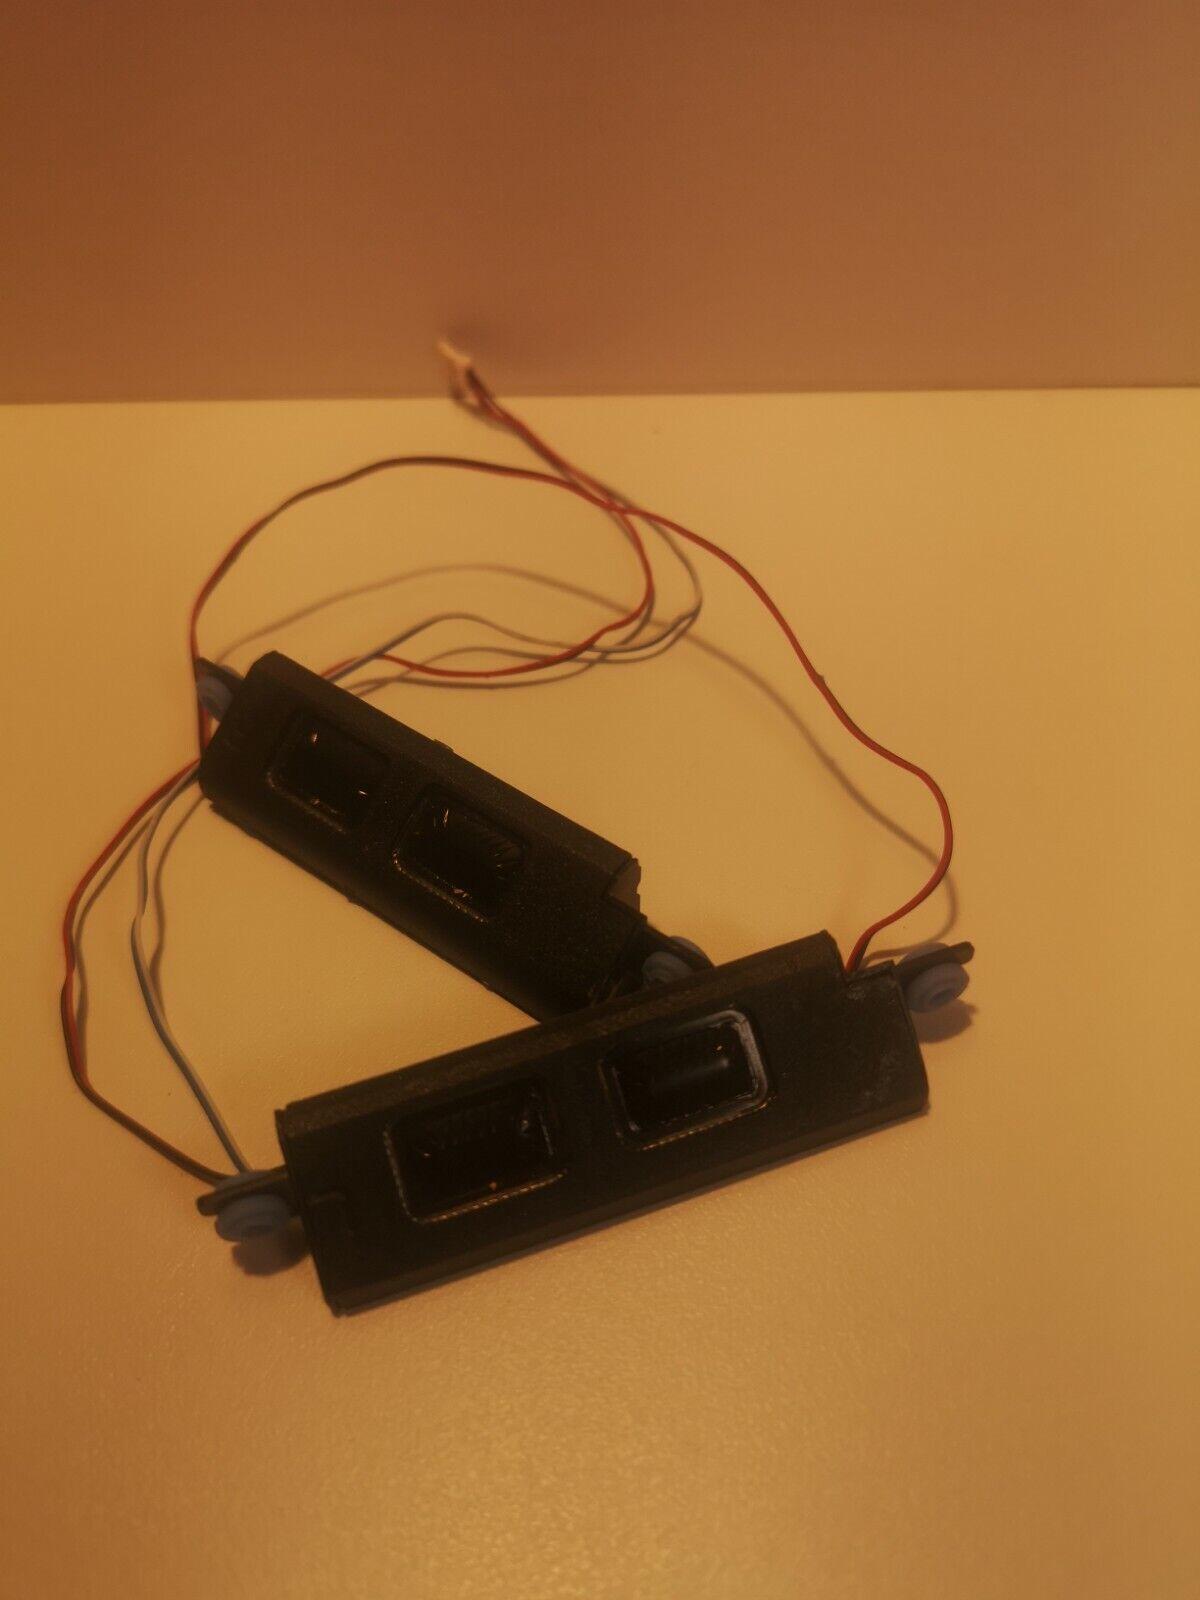 07F42K Dell E6330 Speakers CN-07F42K-GZAC2 Loud speakers + Screws